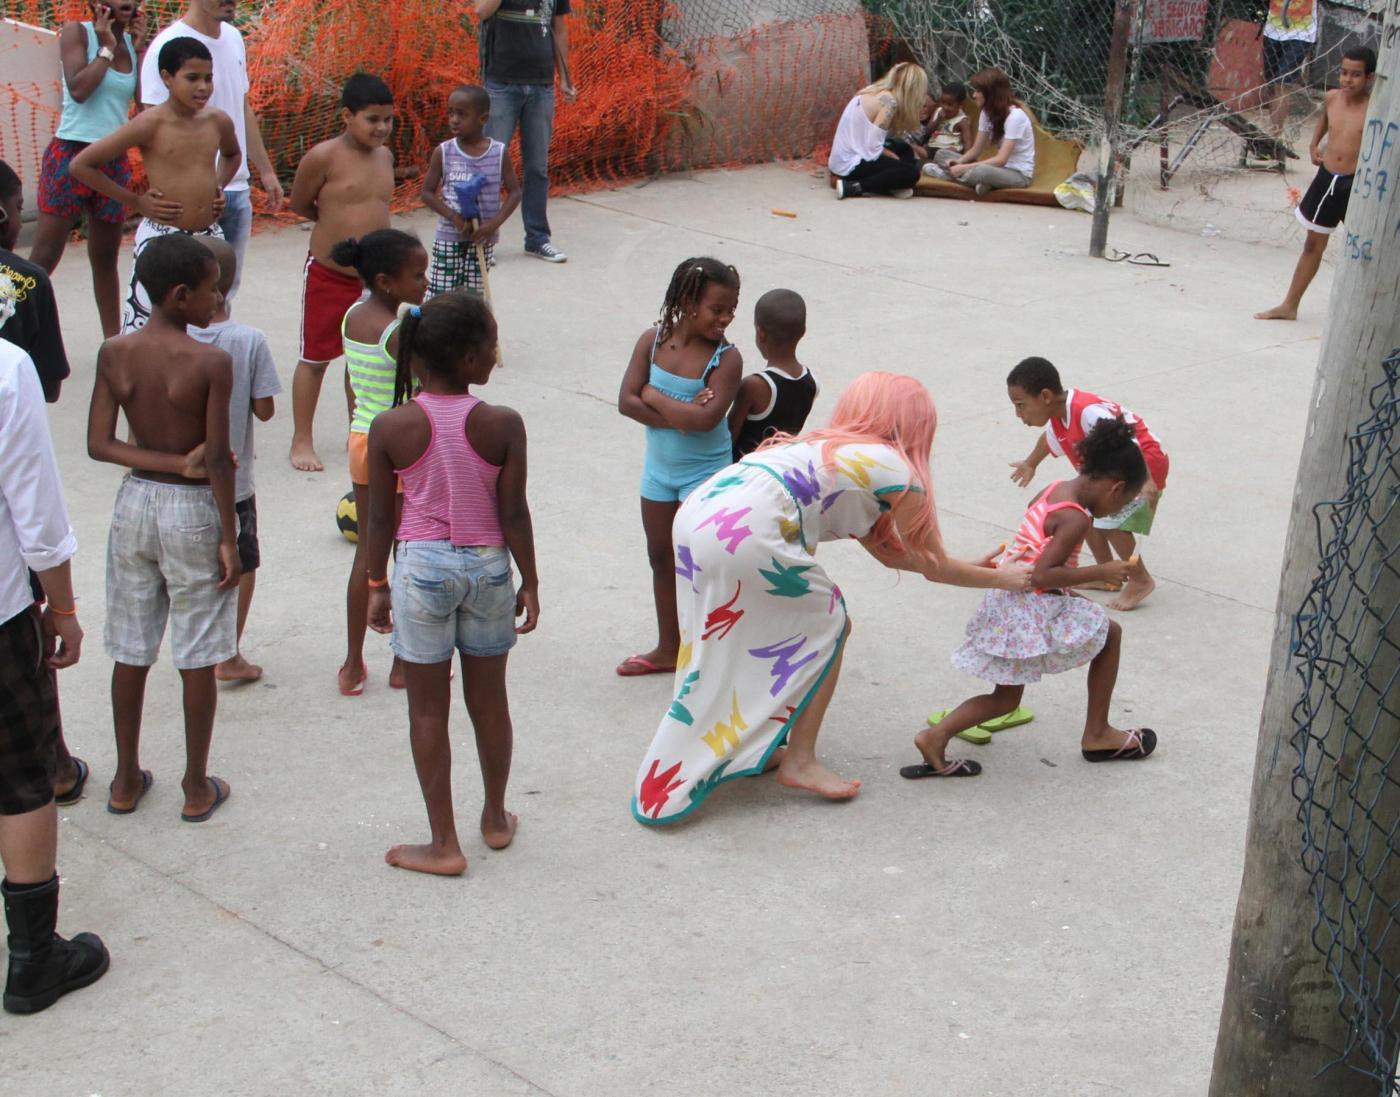 Lady Gaga a piedi nudi a Rio de Janeiro04